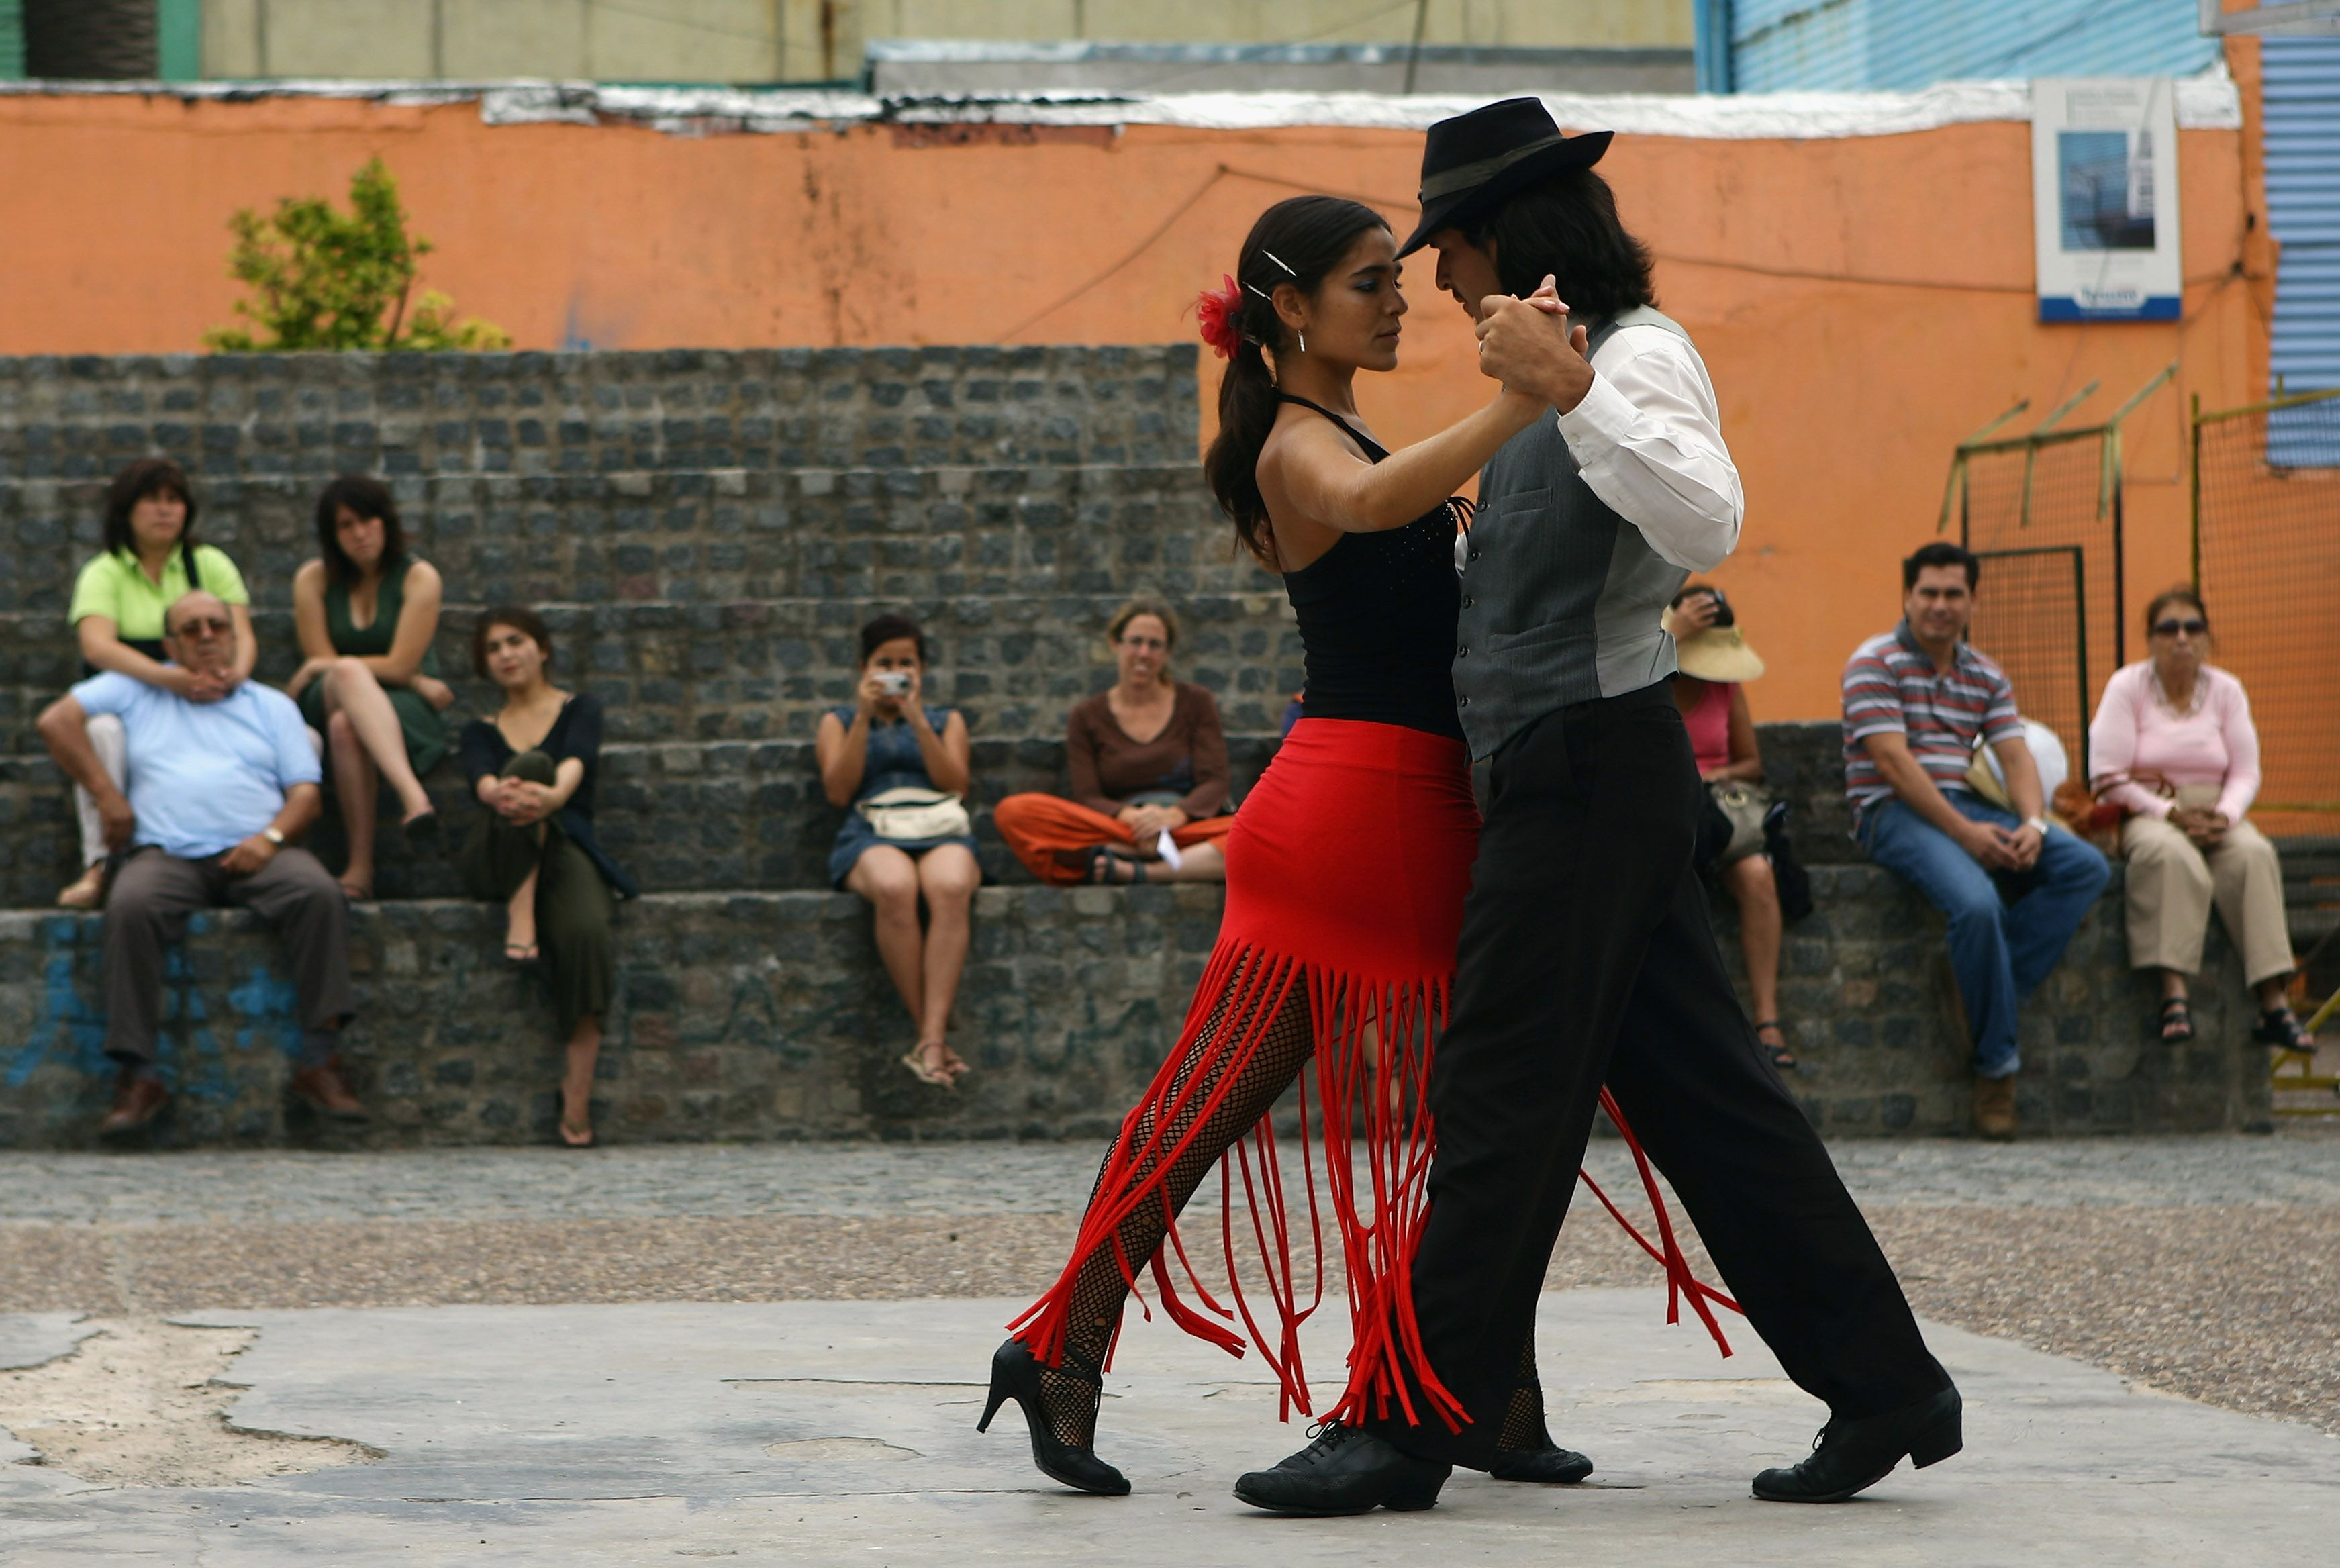 Two people dancing the tango.